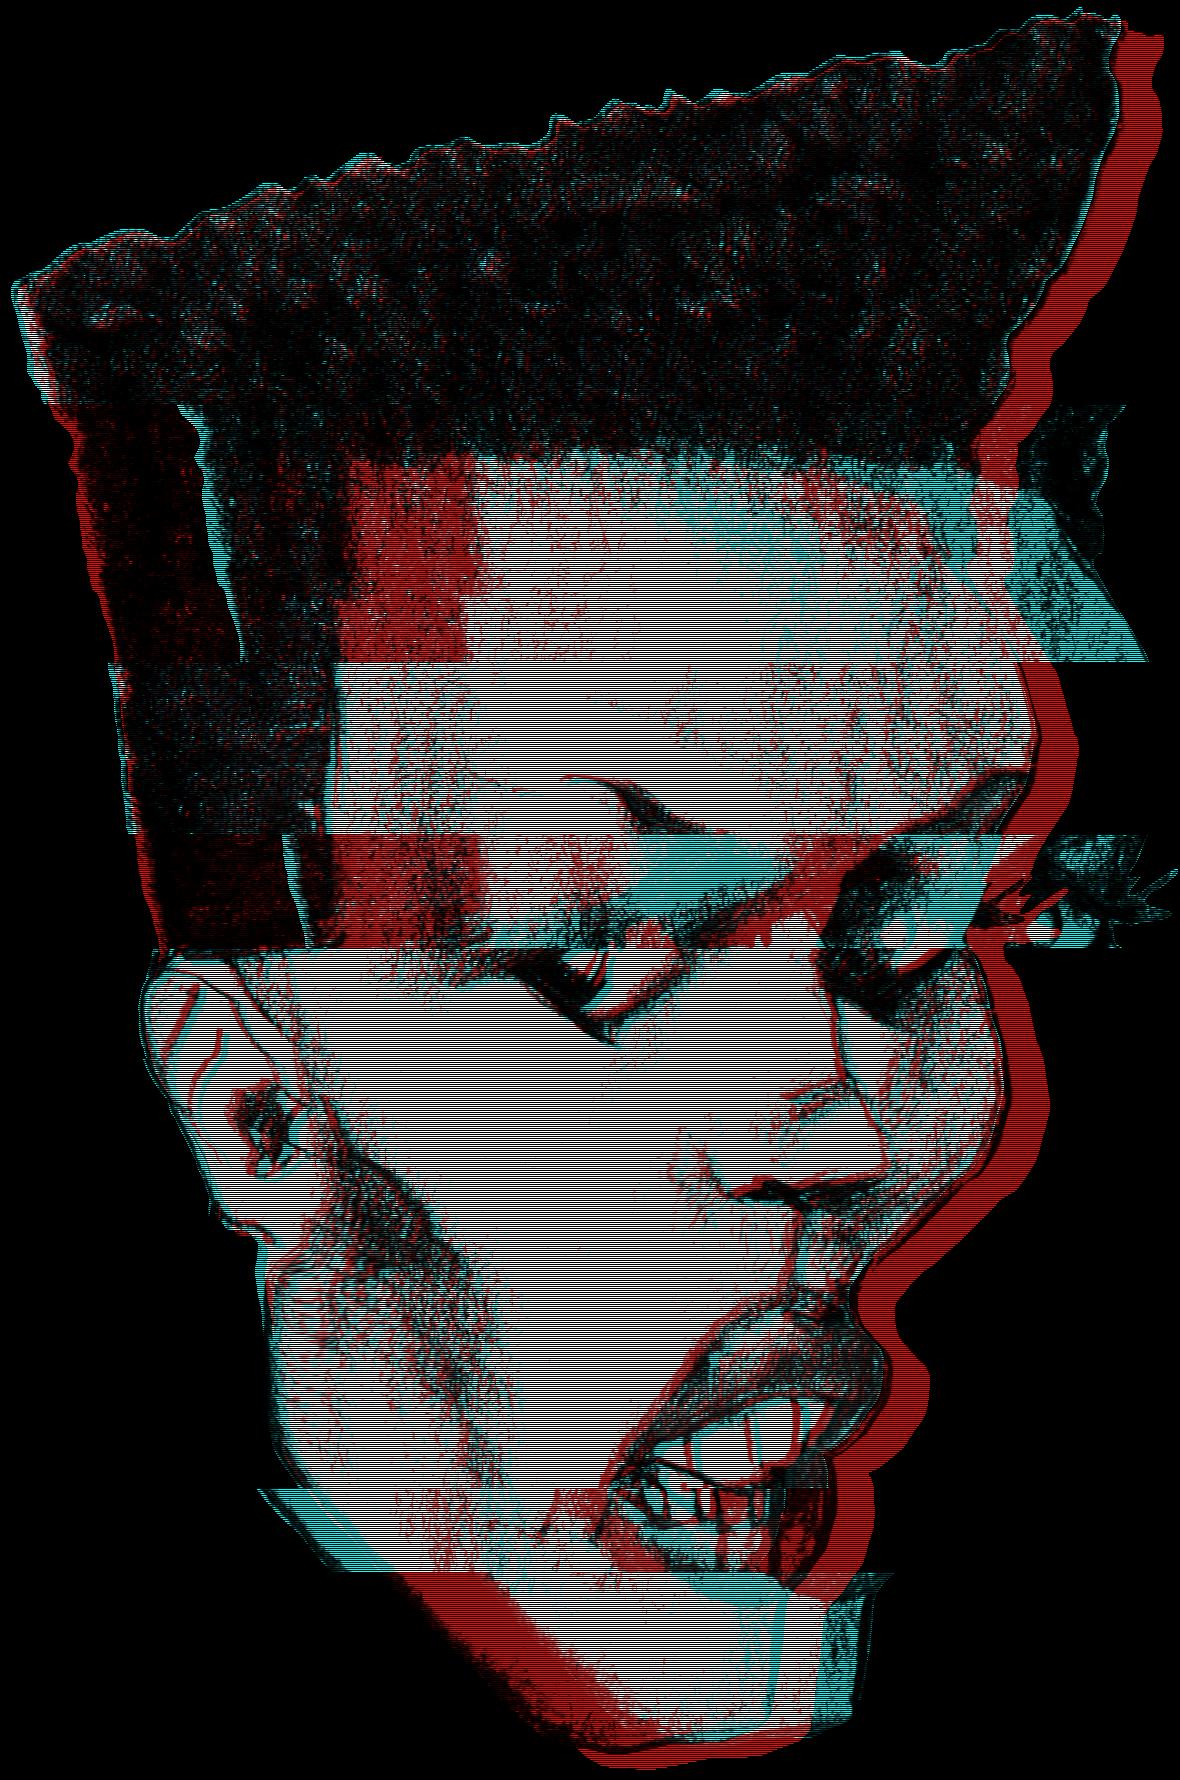 gracehead-glitch1.png